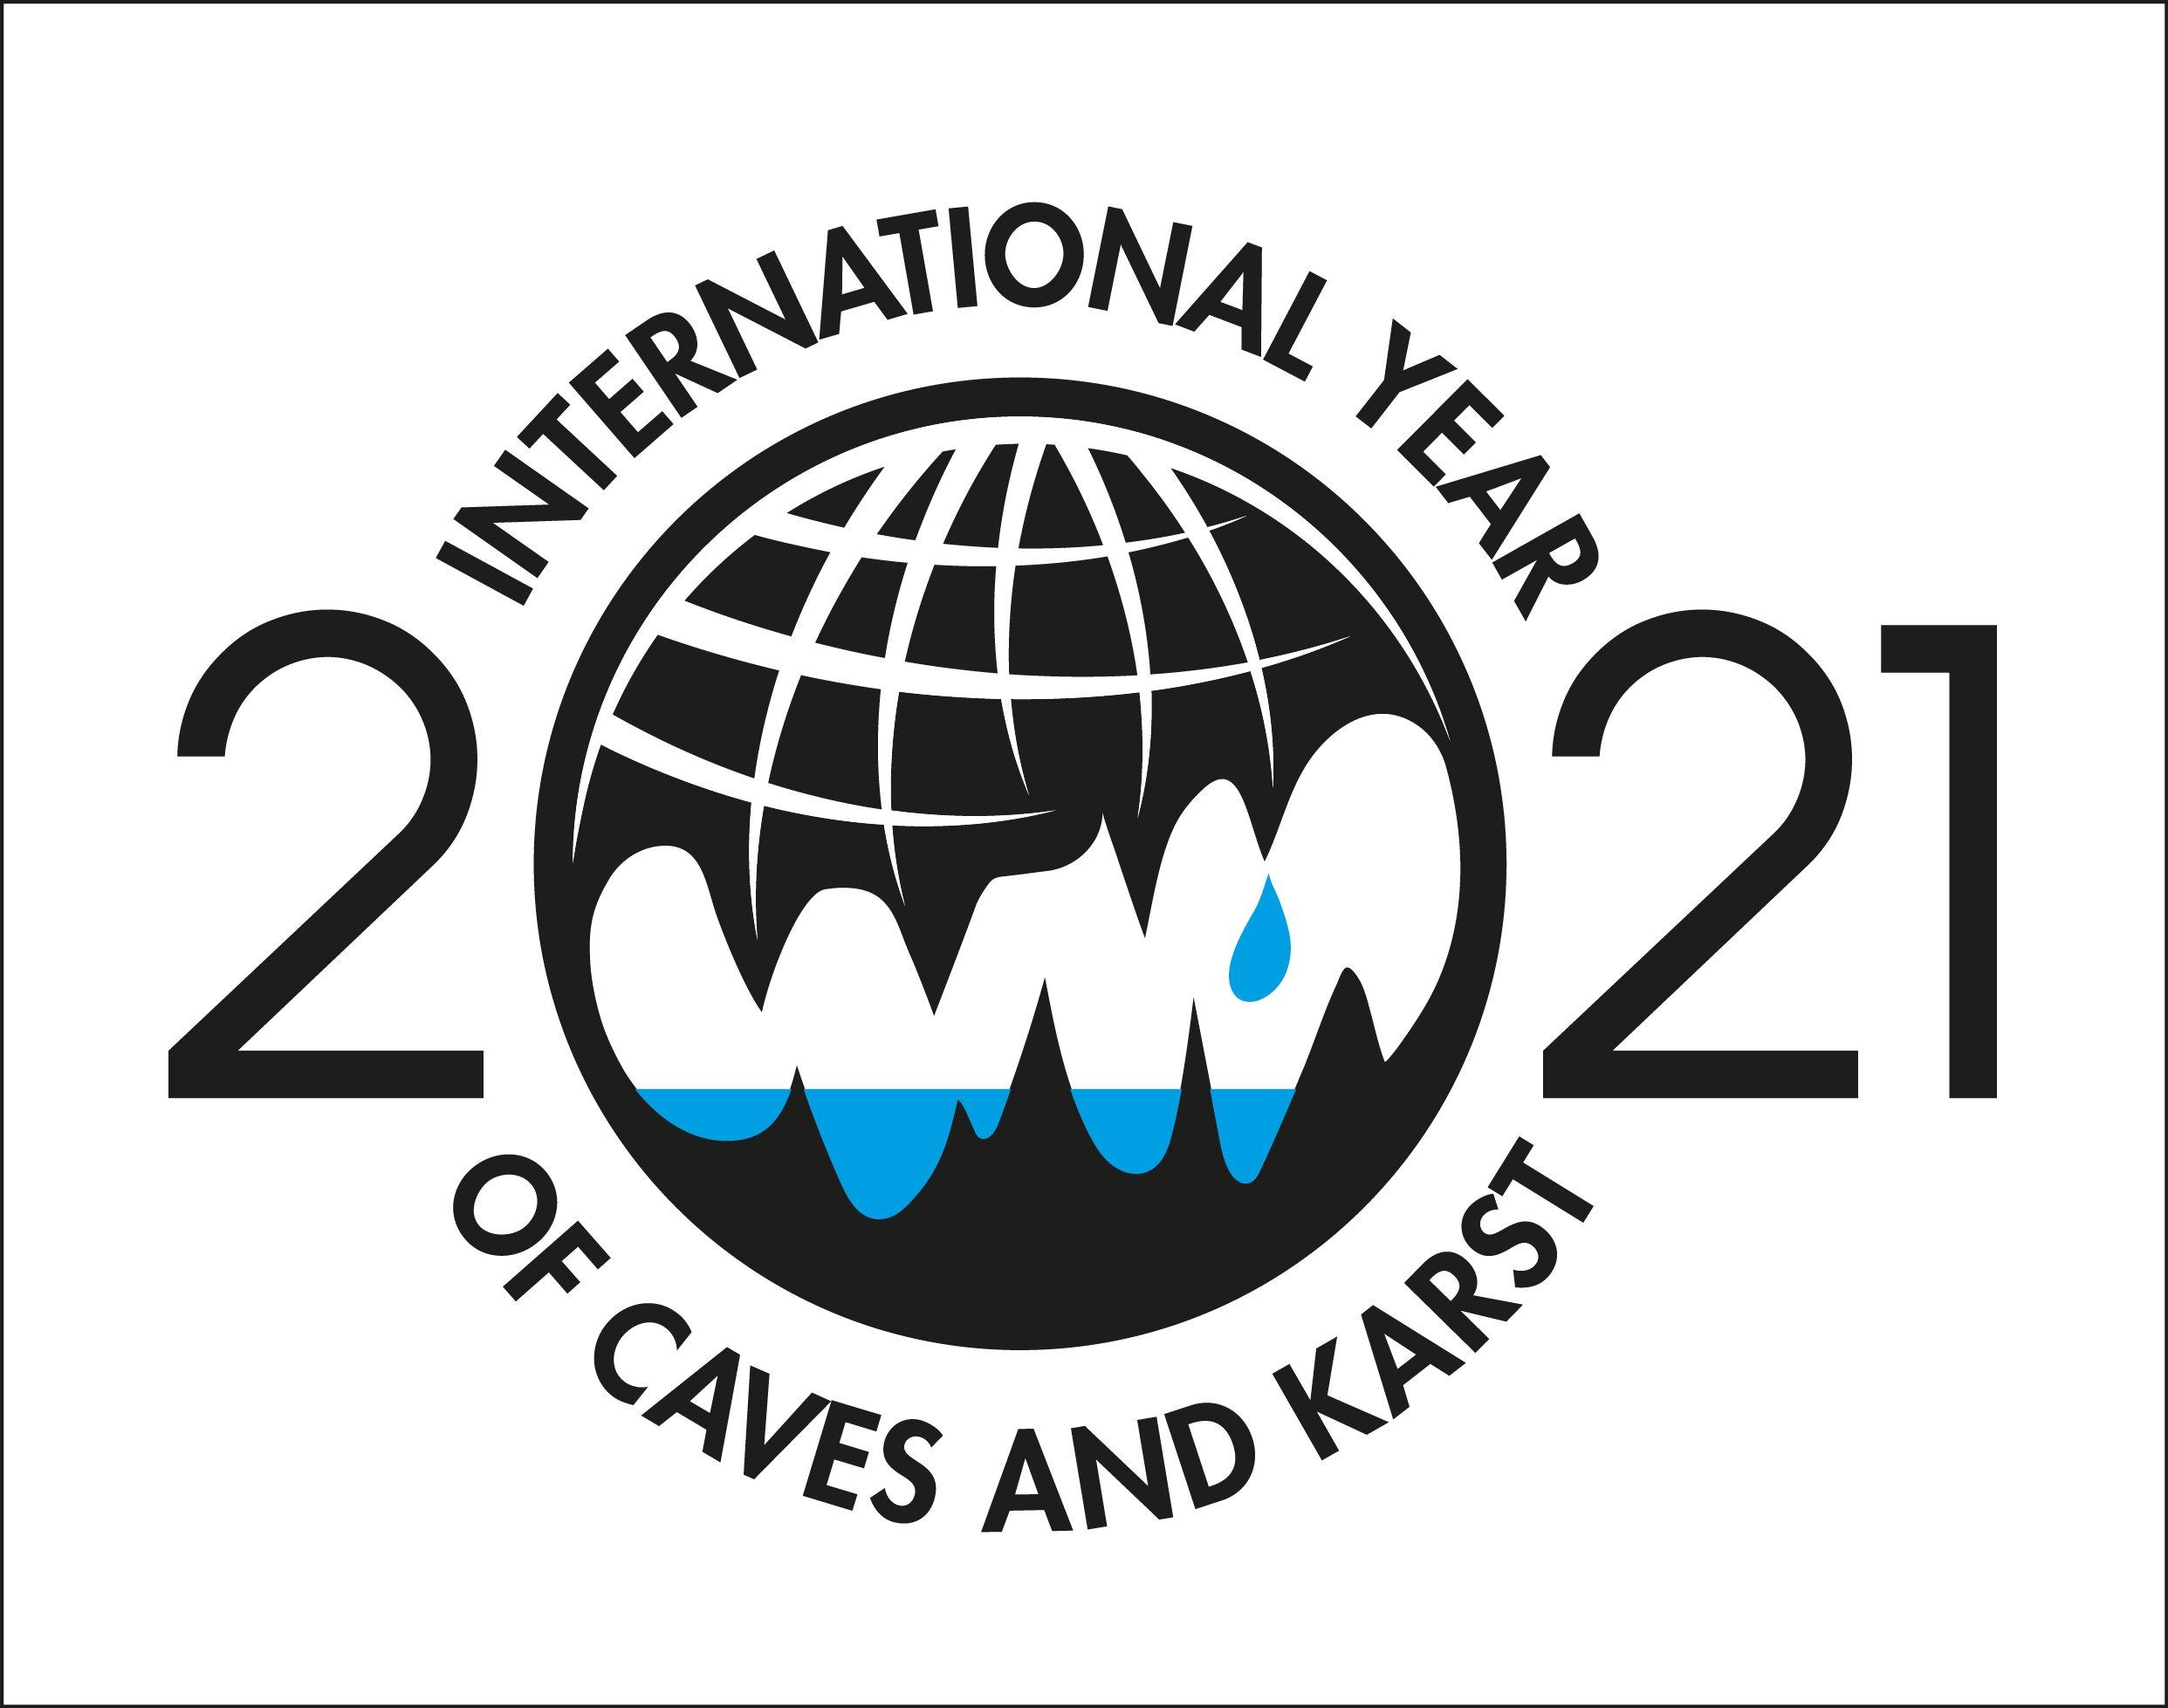 Celebrate 2021 International Year of Caves and Karst at Glenwood Caverns Adventure Park